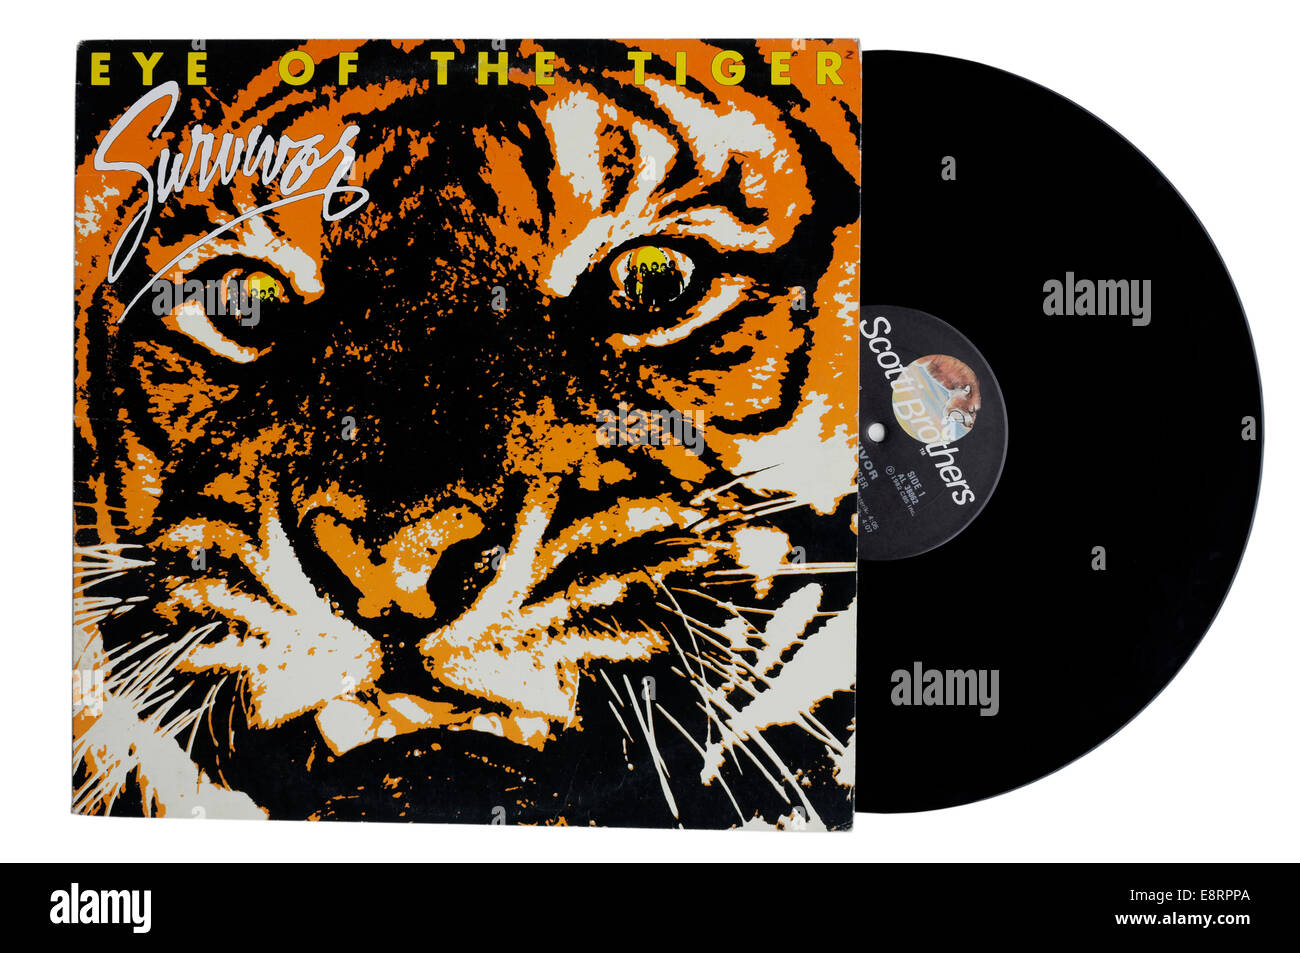 Eye of the Tiger album by Survivor - Stock Image